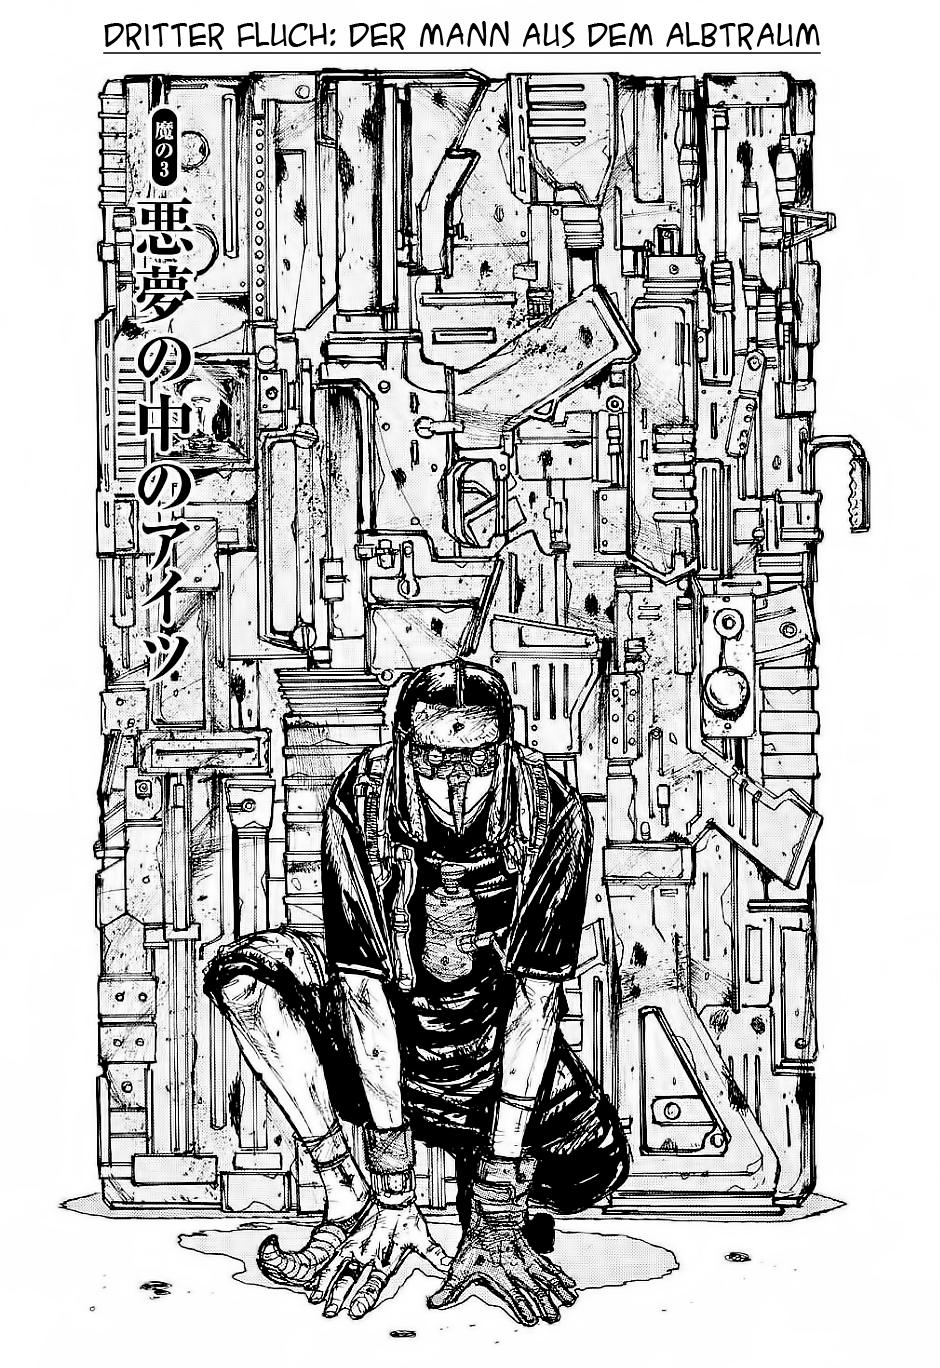 https://wie.mangadogs.com/comics/pic/2/66/190641/Band1Kapitel3DerMannausdem652_0.jpg Page 1